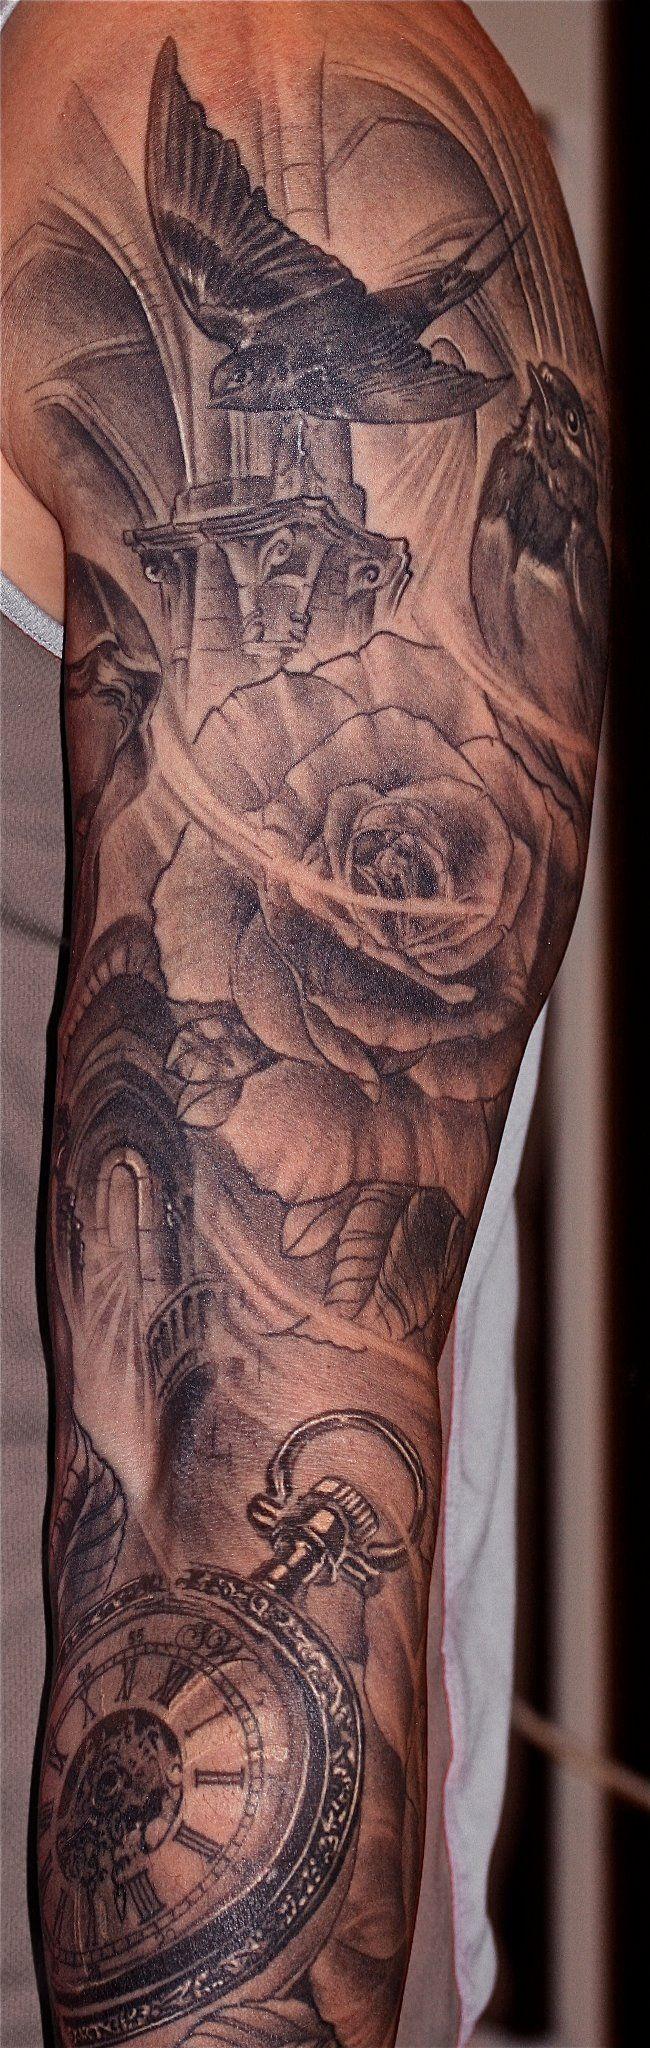 Sleeve tattoo clock black